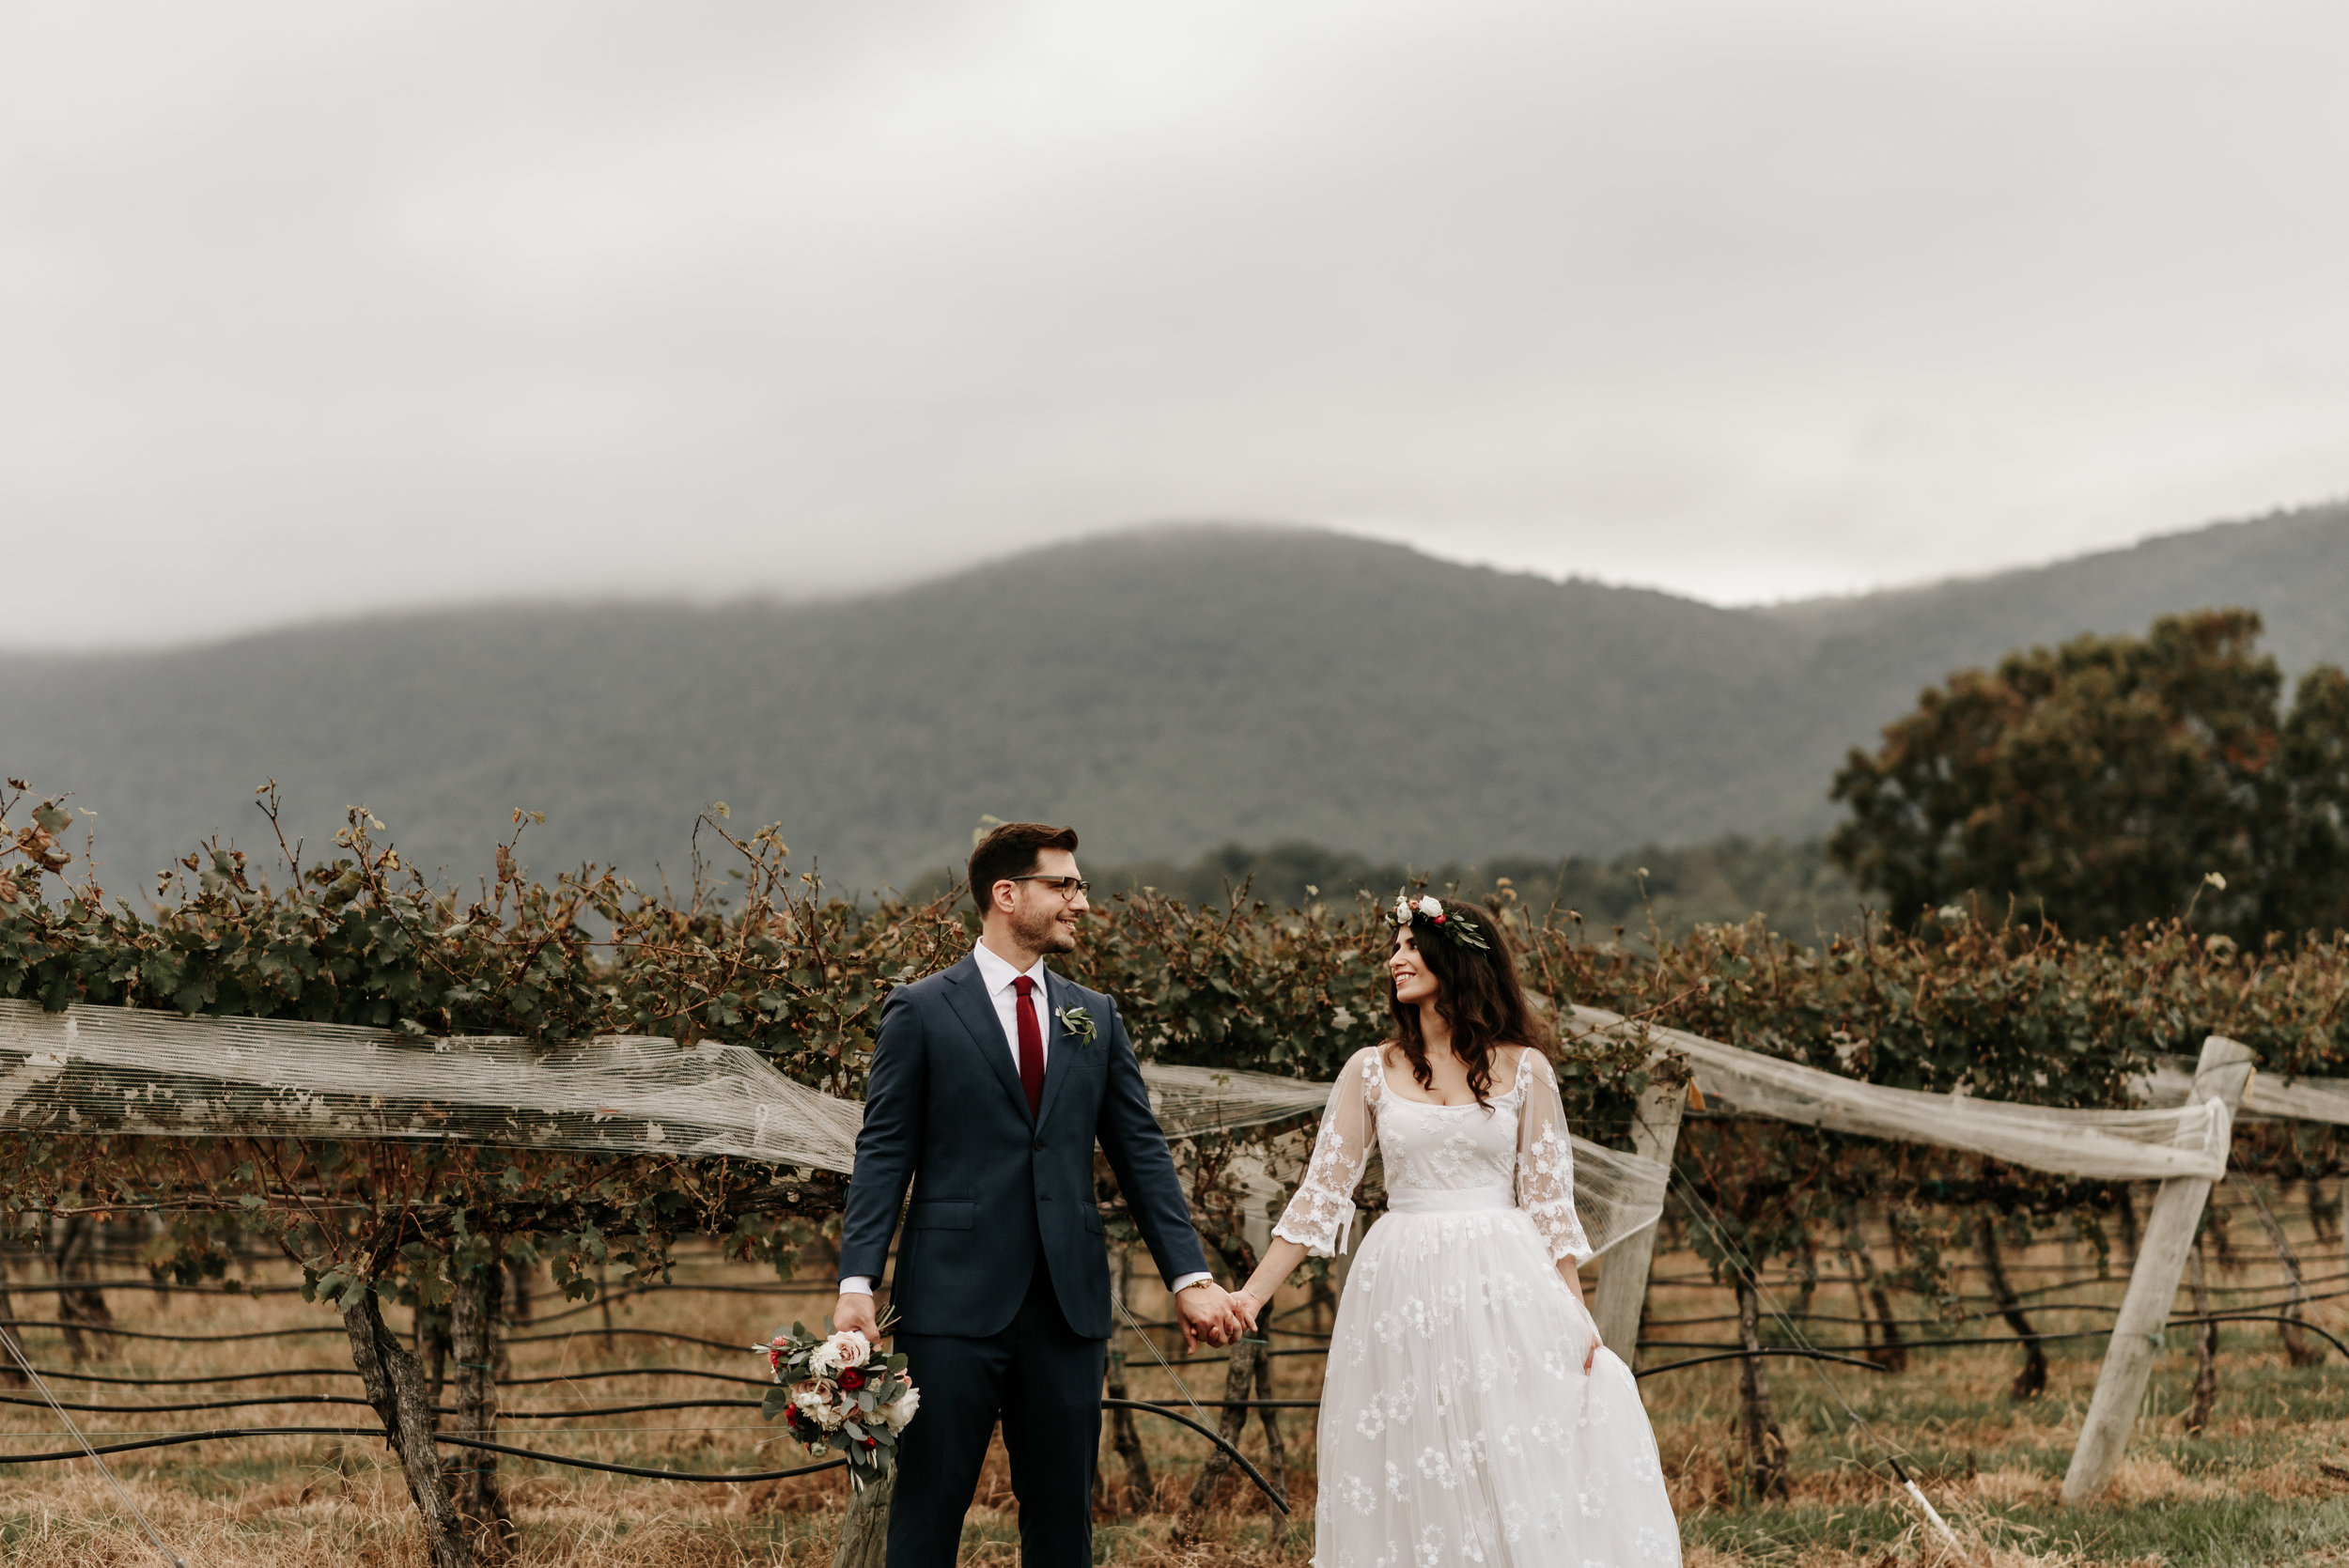 Veritas-Vineyards-and-Winery-Wedding-Photography-Afton-Virginia-Yasmin-Seth-Photography-by-V-2700.jpg